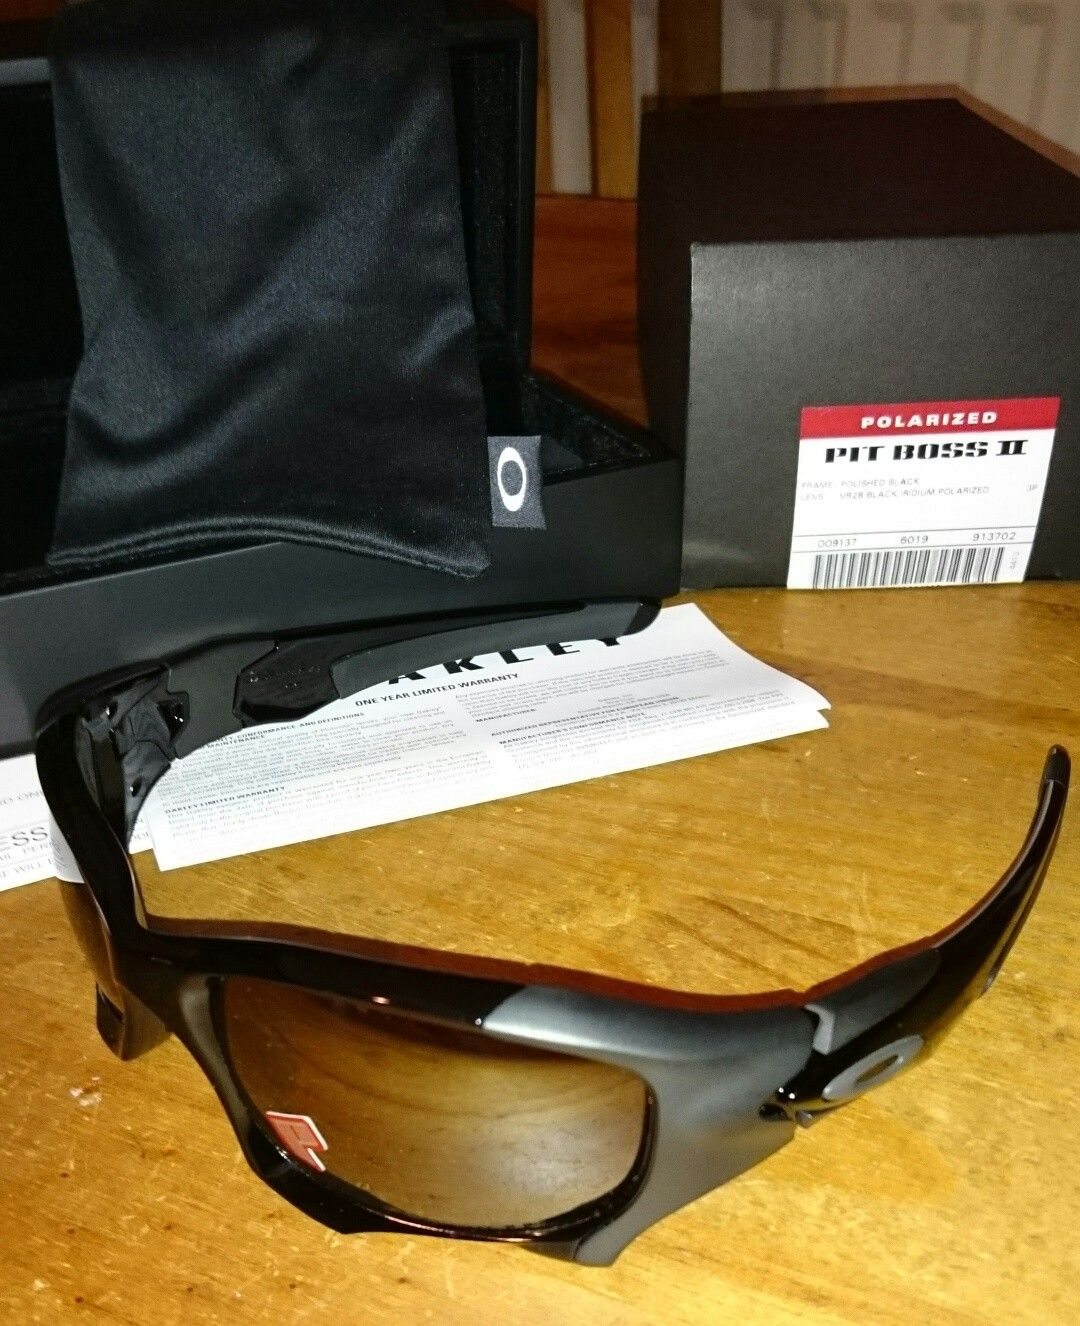 BNIB: PB2 for X-metal Juliet ** Now in sunglasses exchange ** - IMG_20150814_162613.JPG